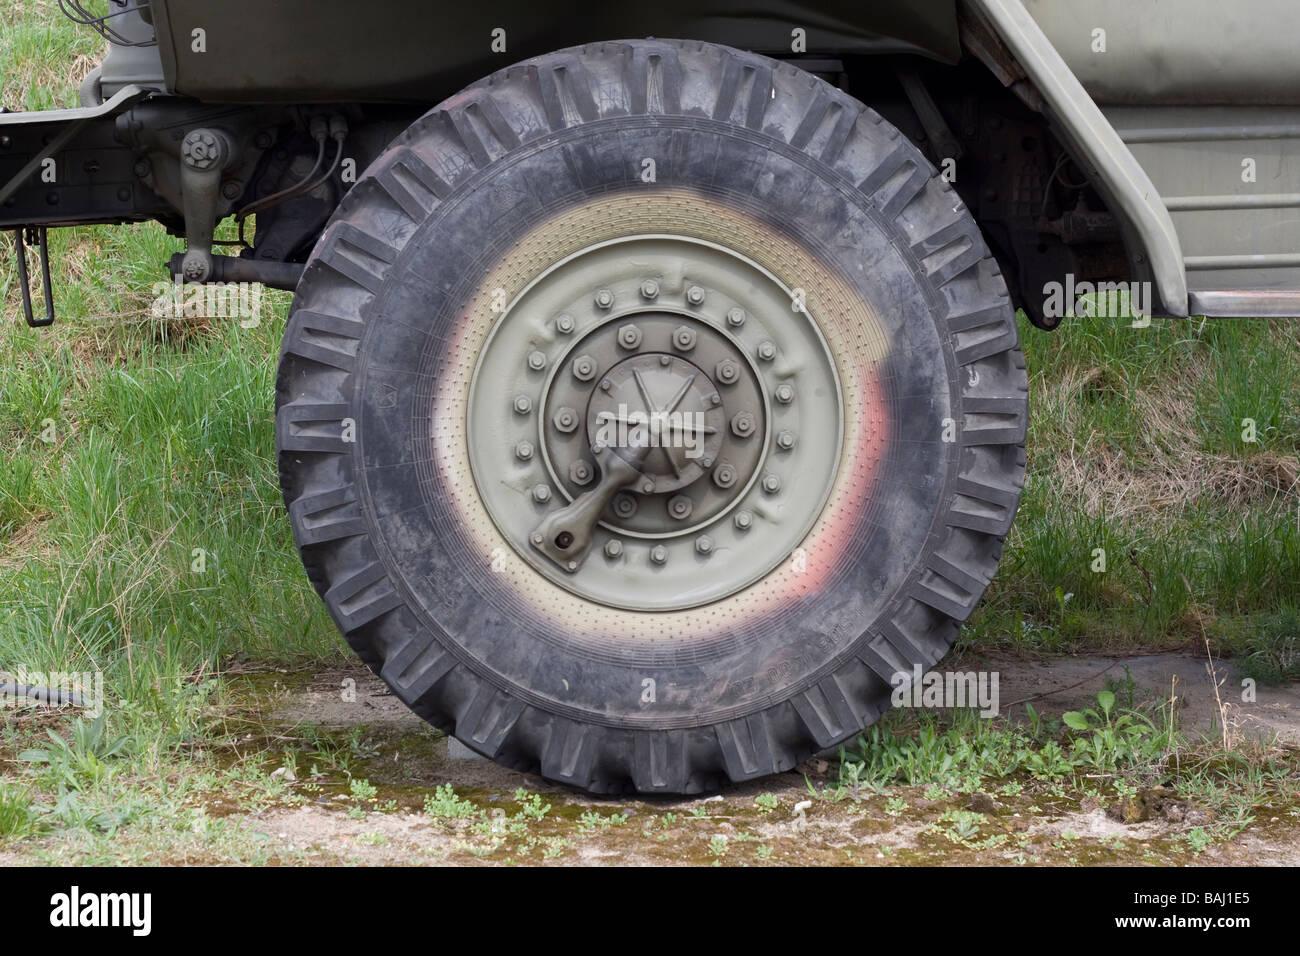 Militär-Lkw-Rad Stockfoto, Bild: 23753245 - Alamy